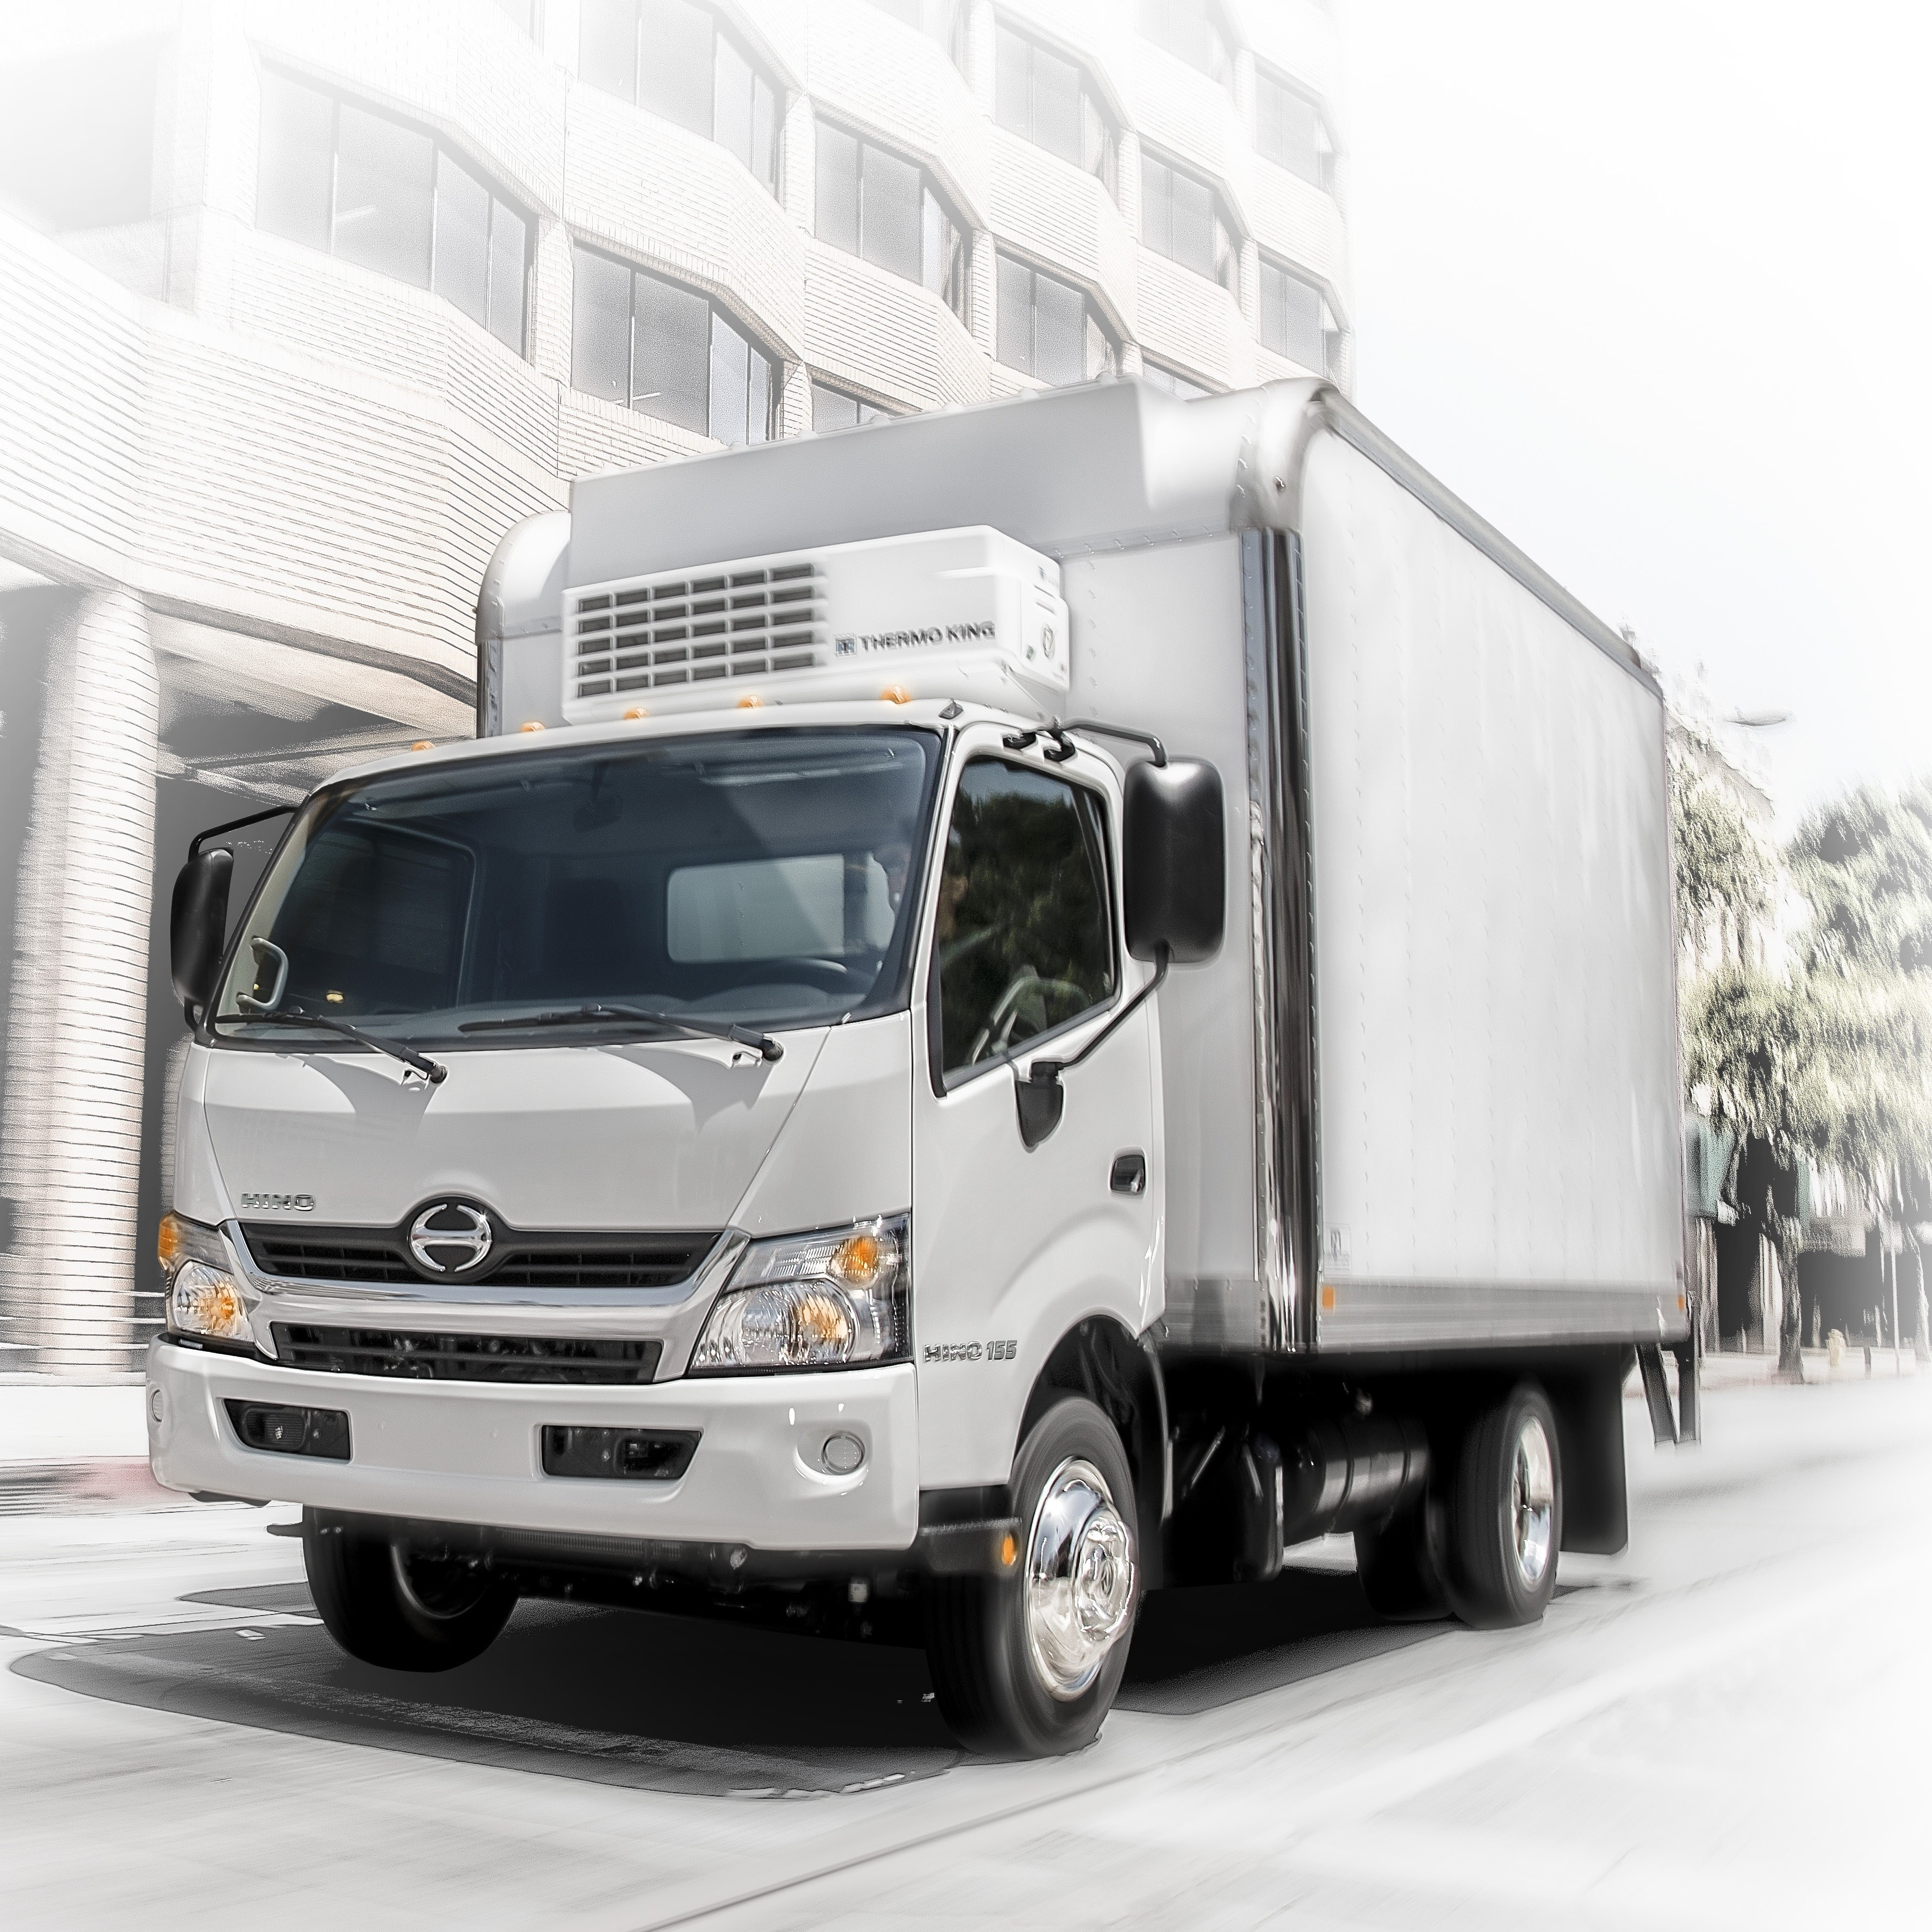 Hino of Chicago | Truck sales in Cicero, IL